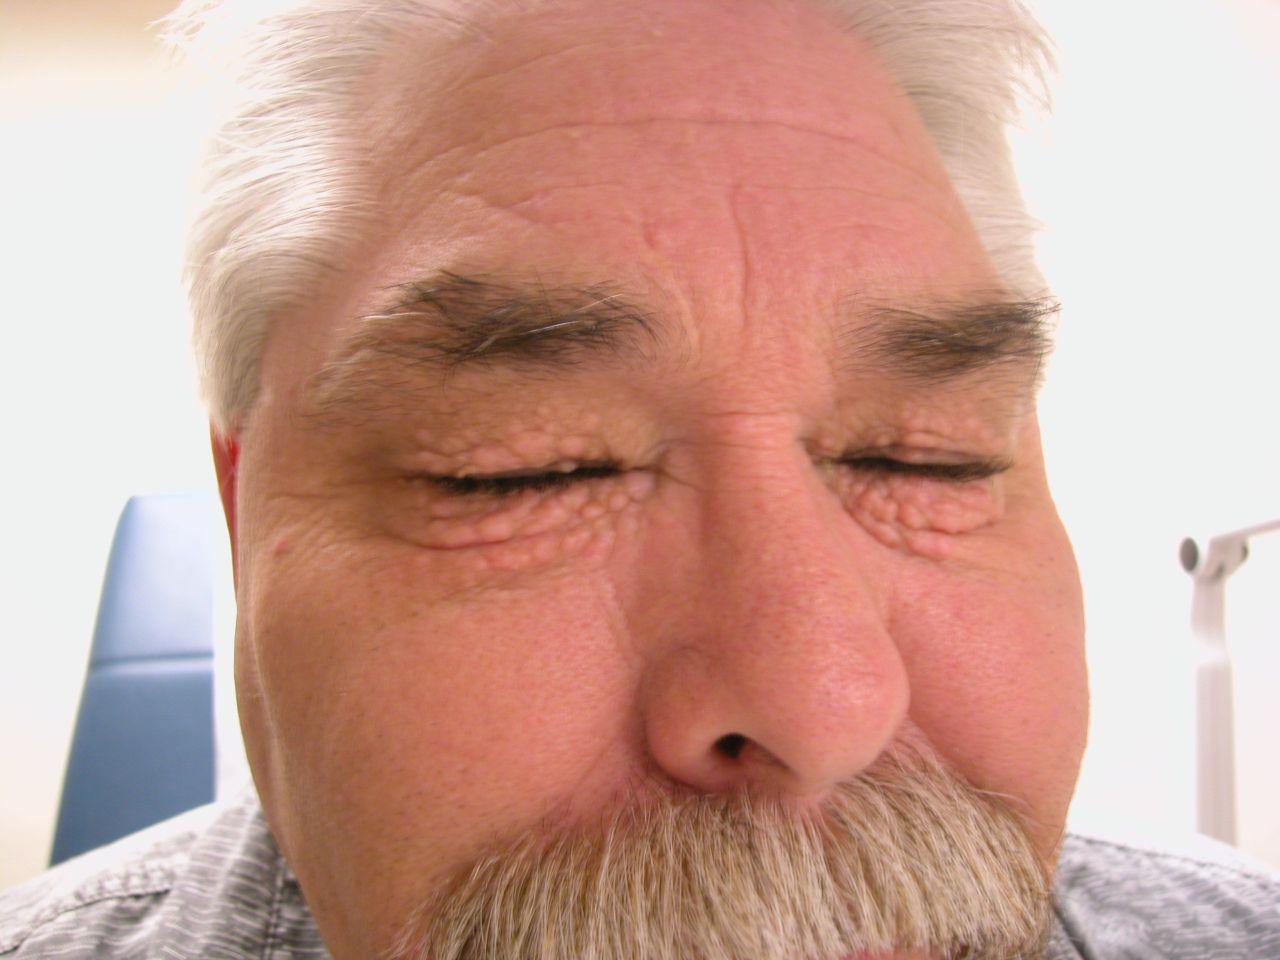 Periorbital syringoma